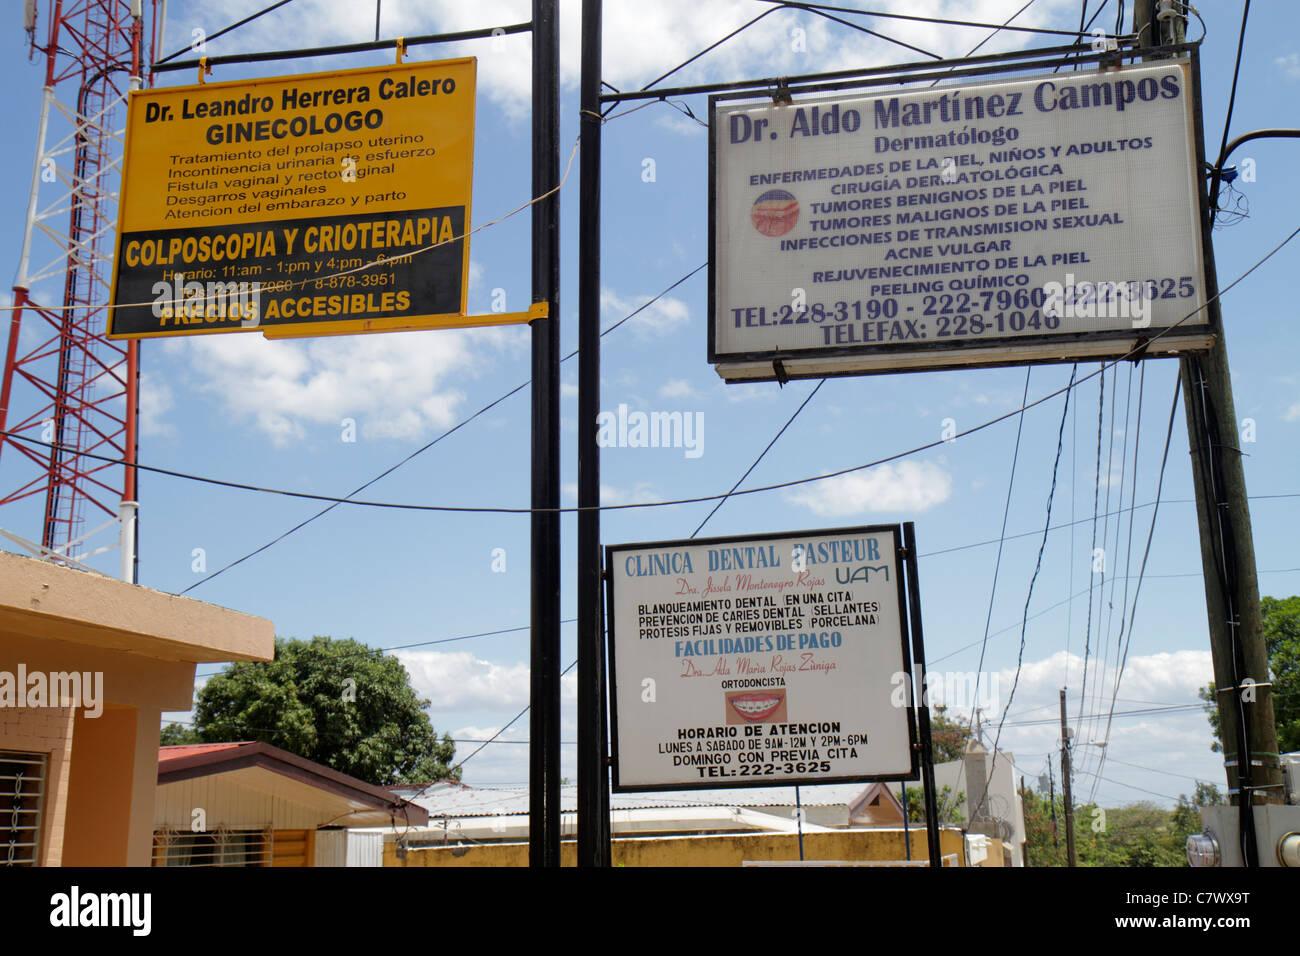 Managua Nicaragua Barrio Willian Diaz neighborhood doctor's office dental clinic dermatologist gynecologist - Stock Image